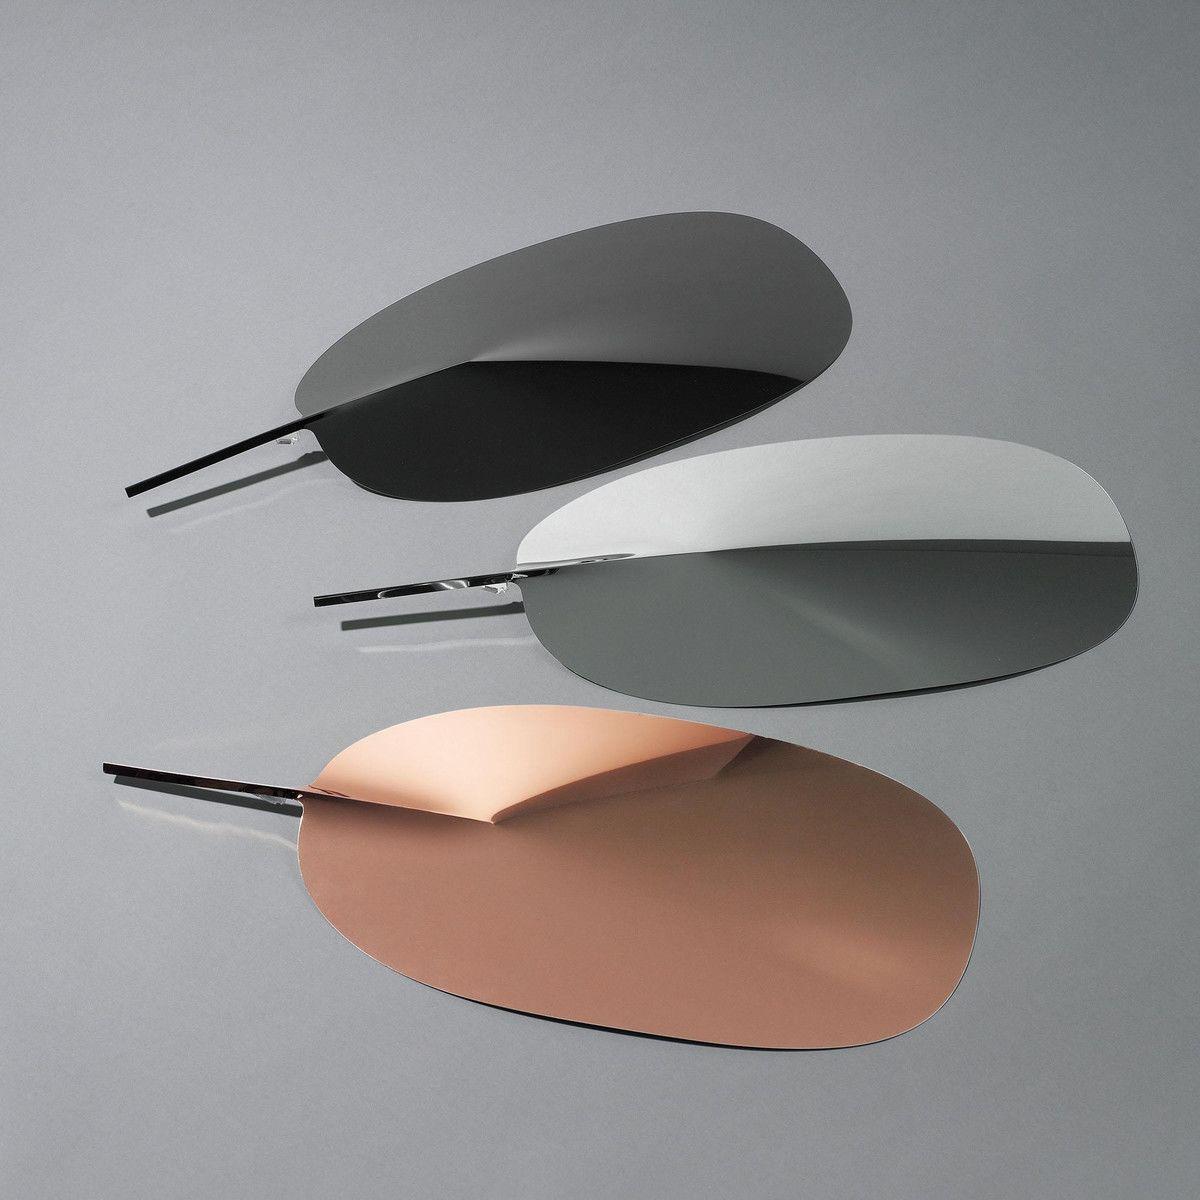 serena led tischleuchte flos leuchtmittel leuchten. Black Bedroom Furniture Sets. Home Design Ideas